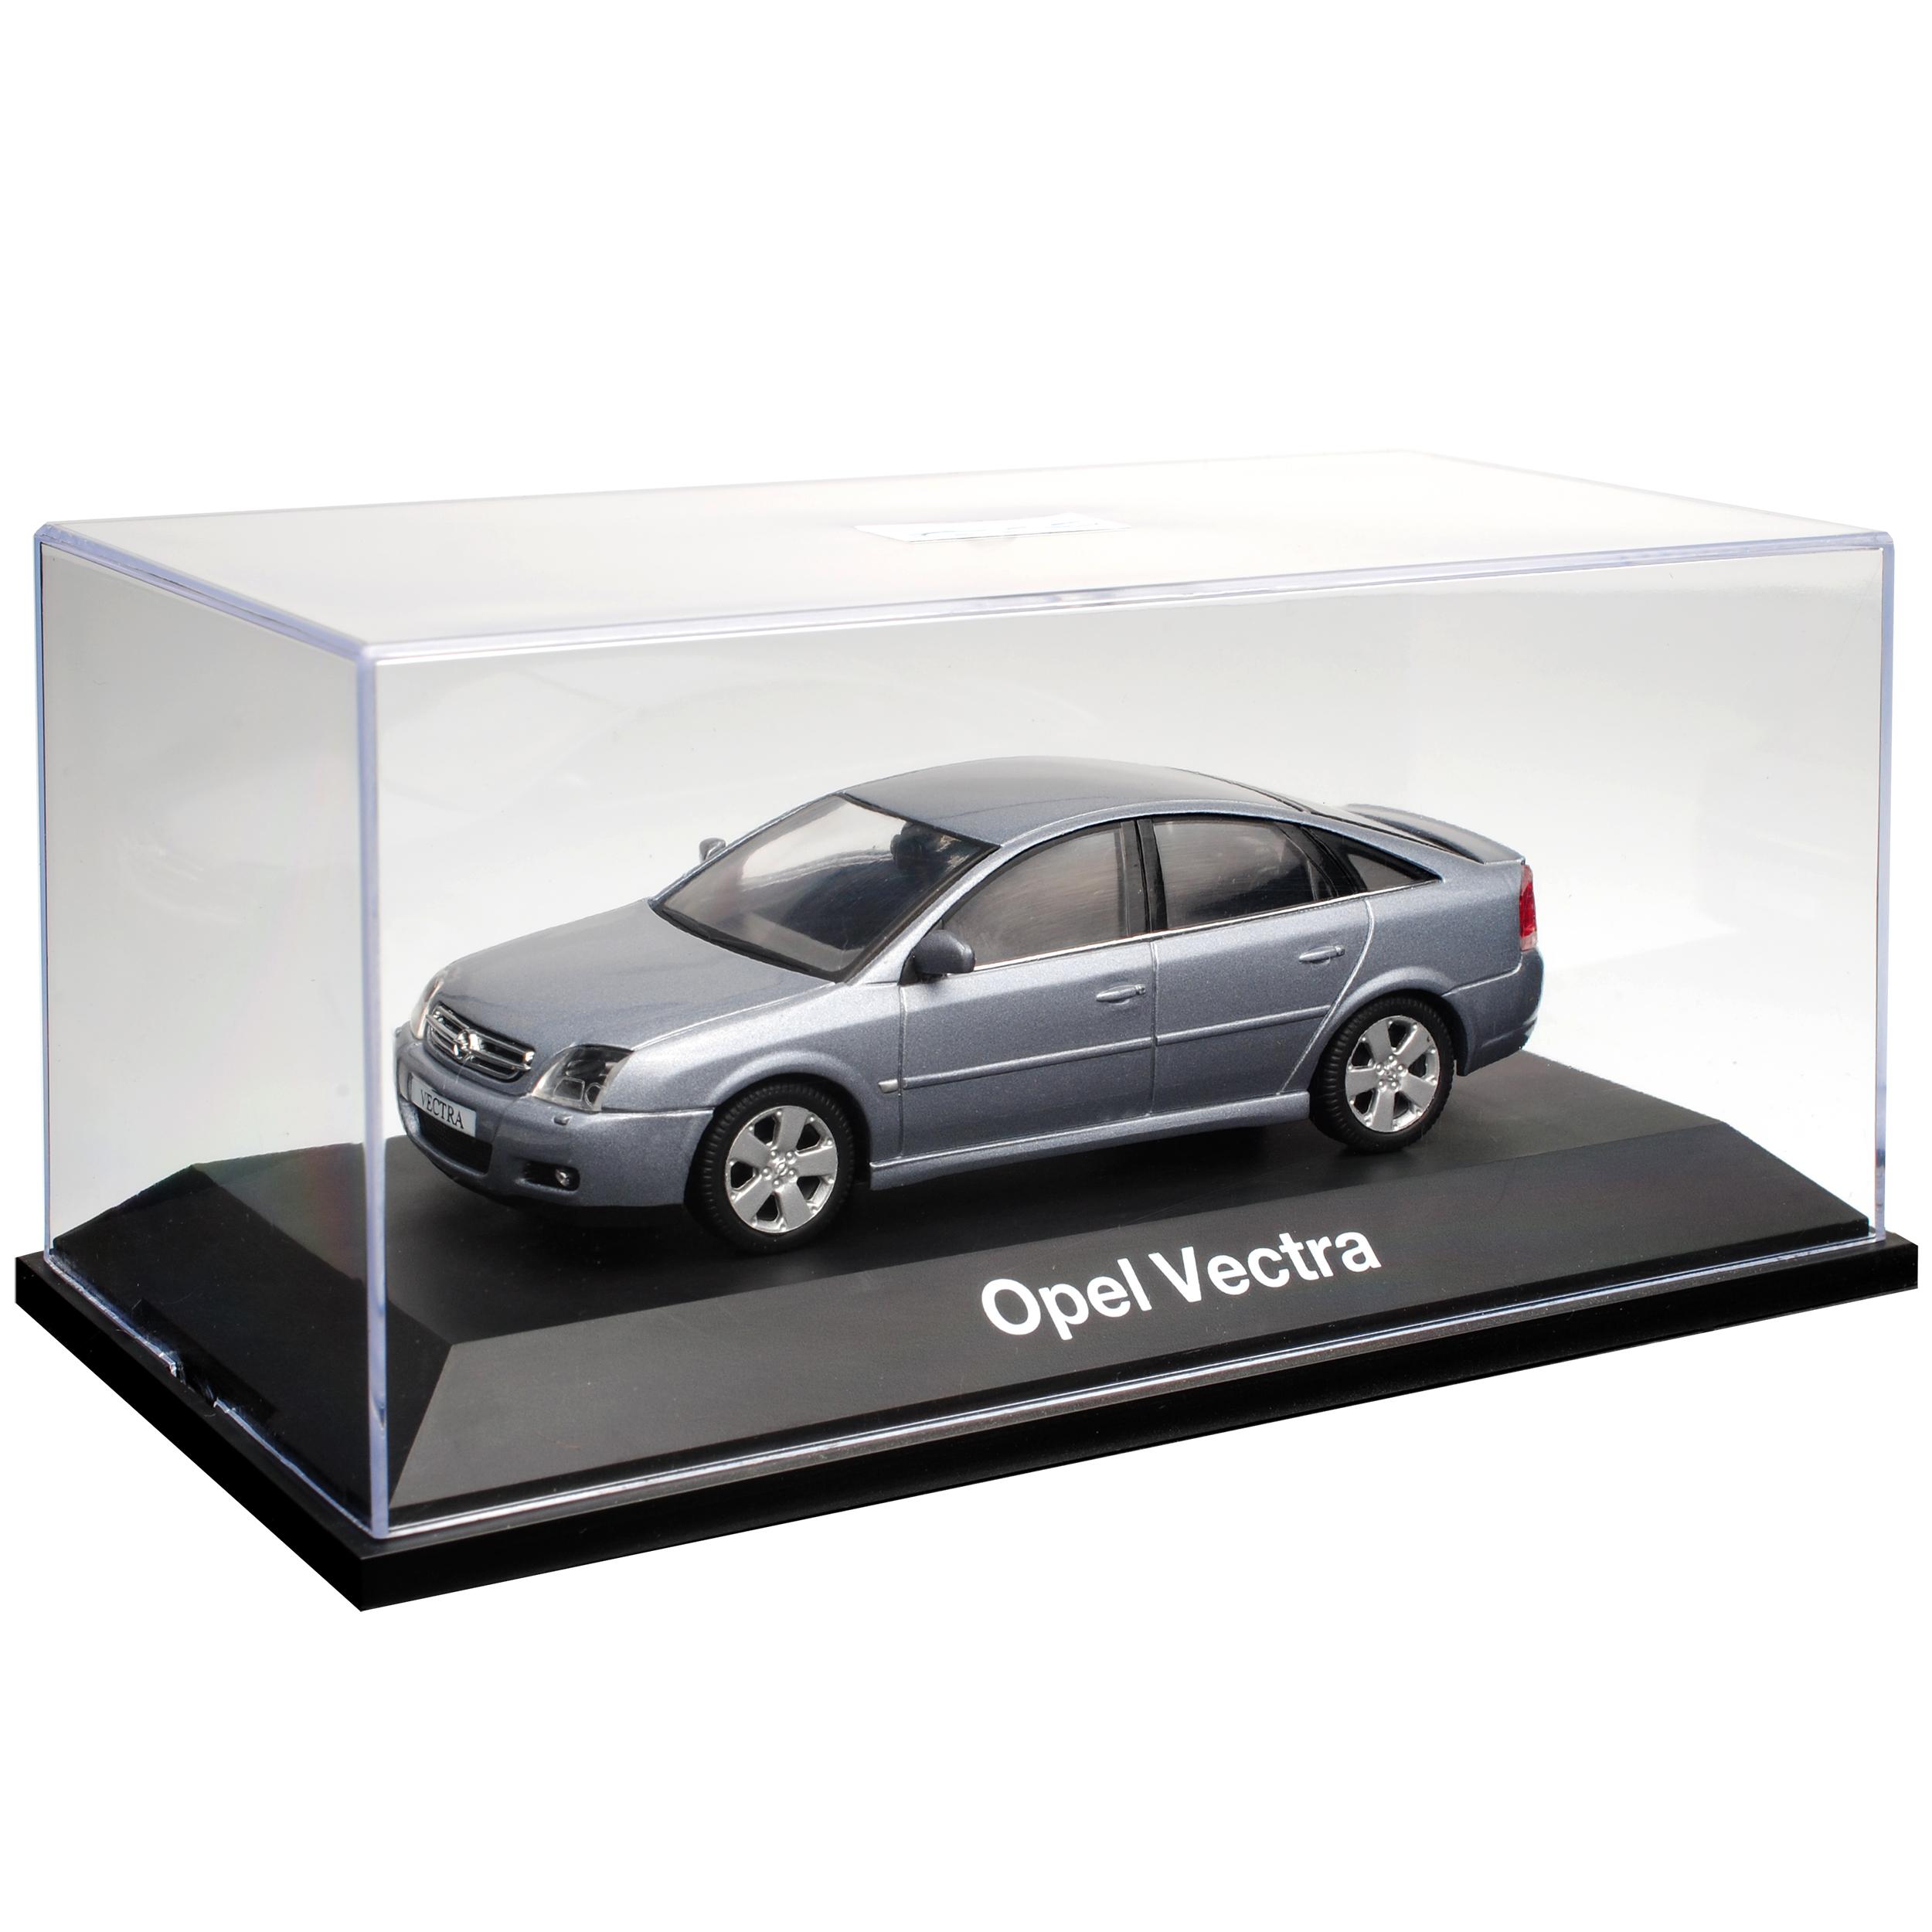 Opel Vectra C GTS Limousine Grau 2002-2008 1//43 Schuco Modell Auto mit oder oh..